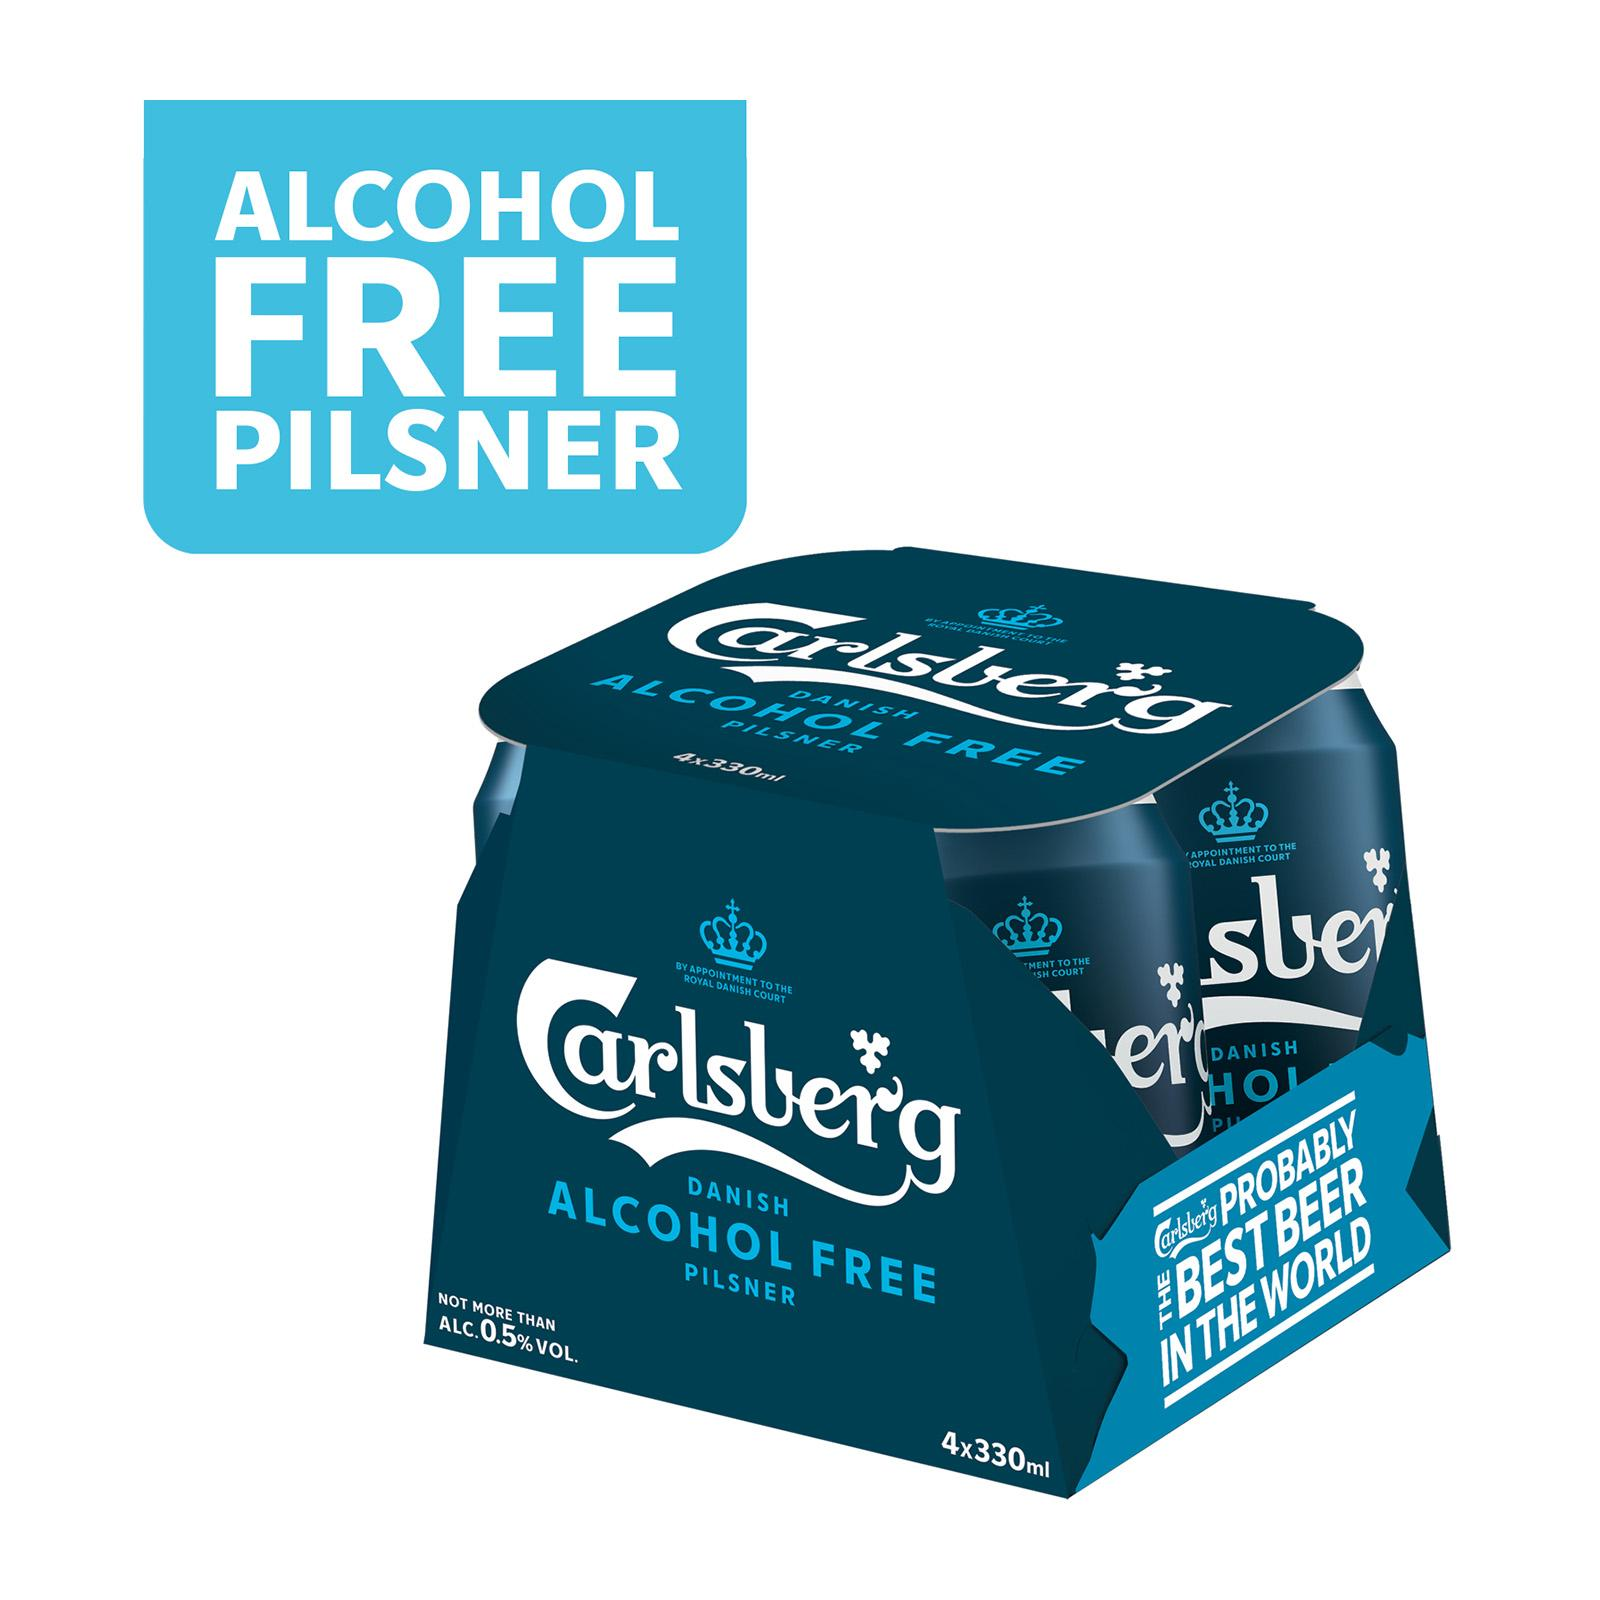 Carlsberg Alcohol Free Pilsner Beer Can 330ml (Pack of 4)